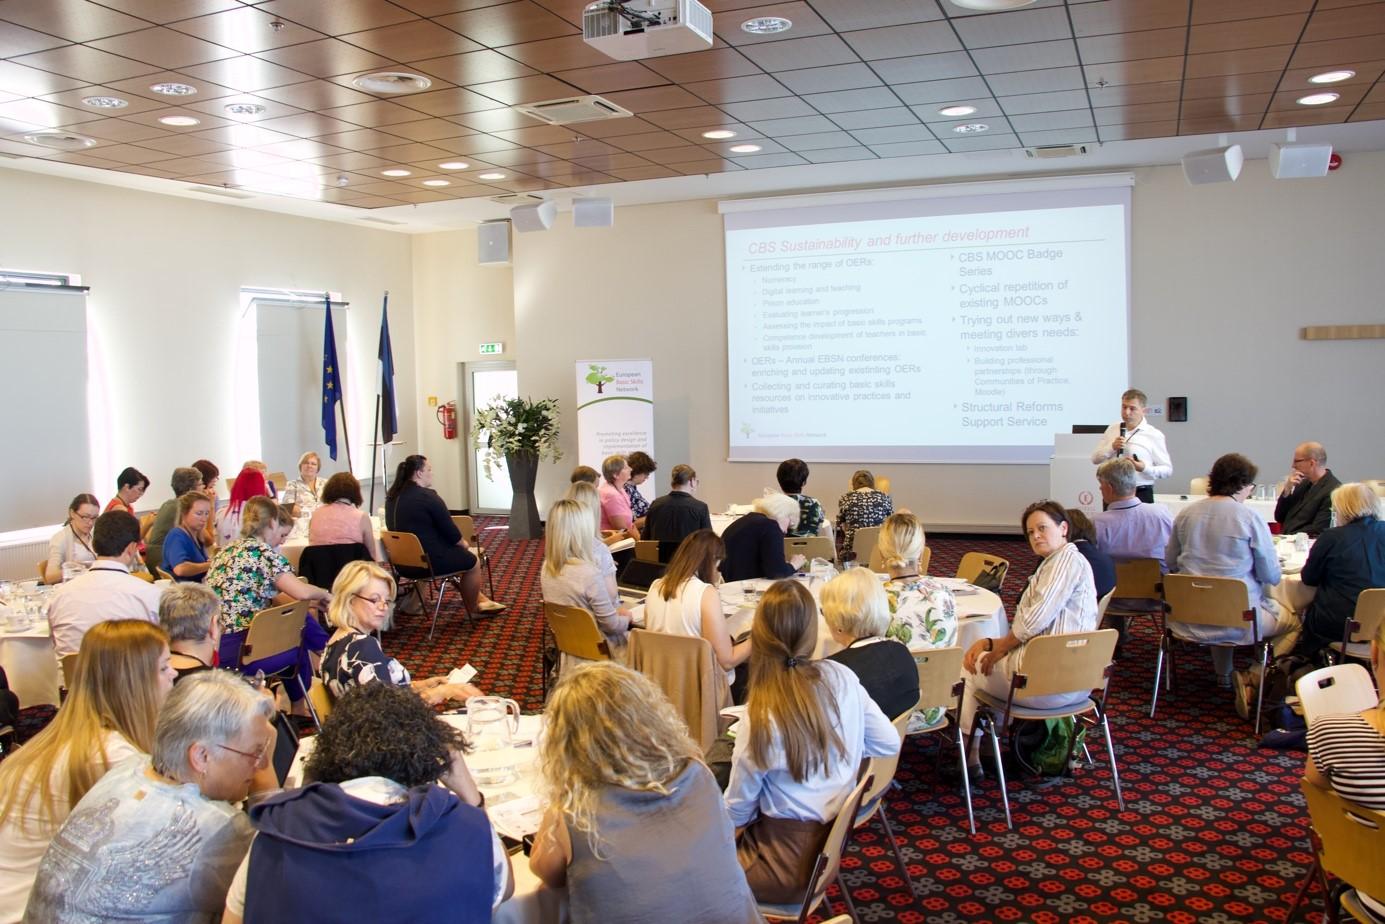 Workshop 95 Addressing Students >> Ebsn Annual Conference In Tallinn Ebsn